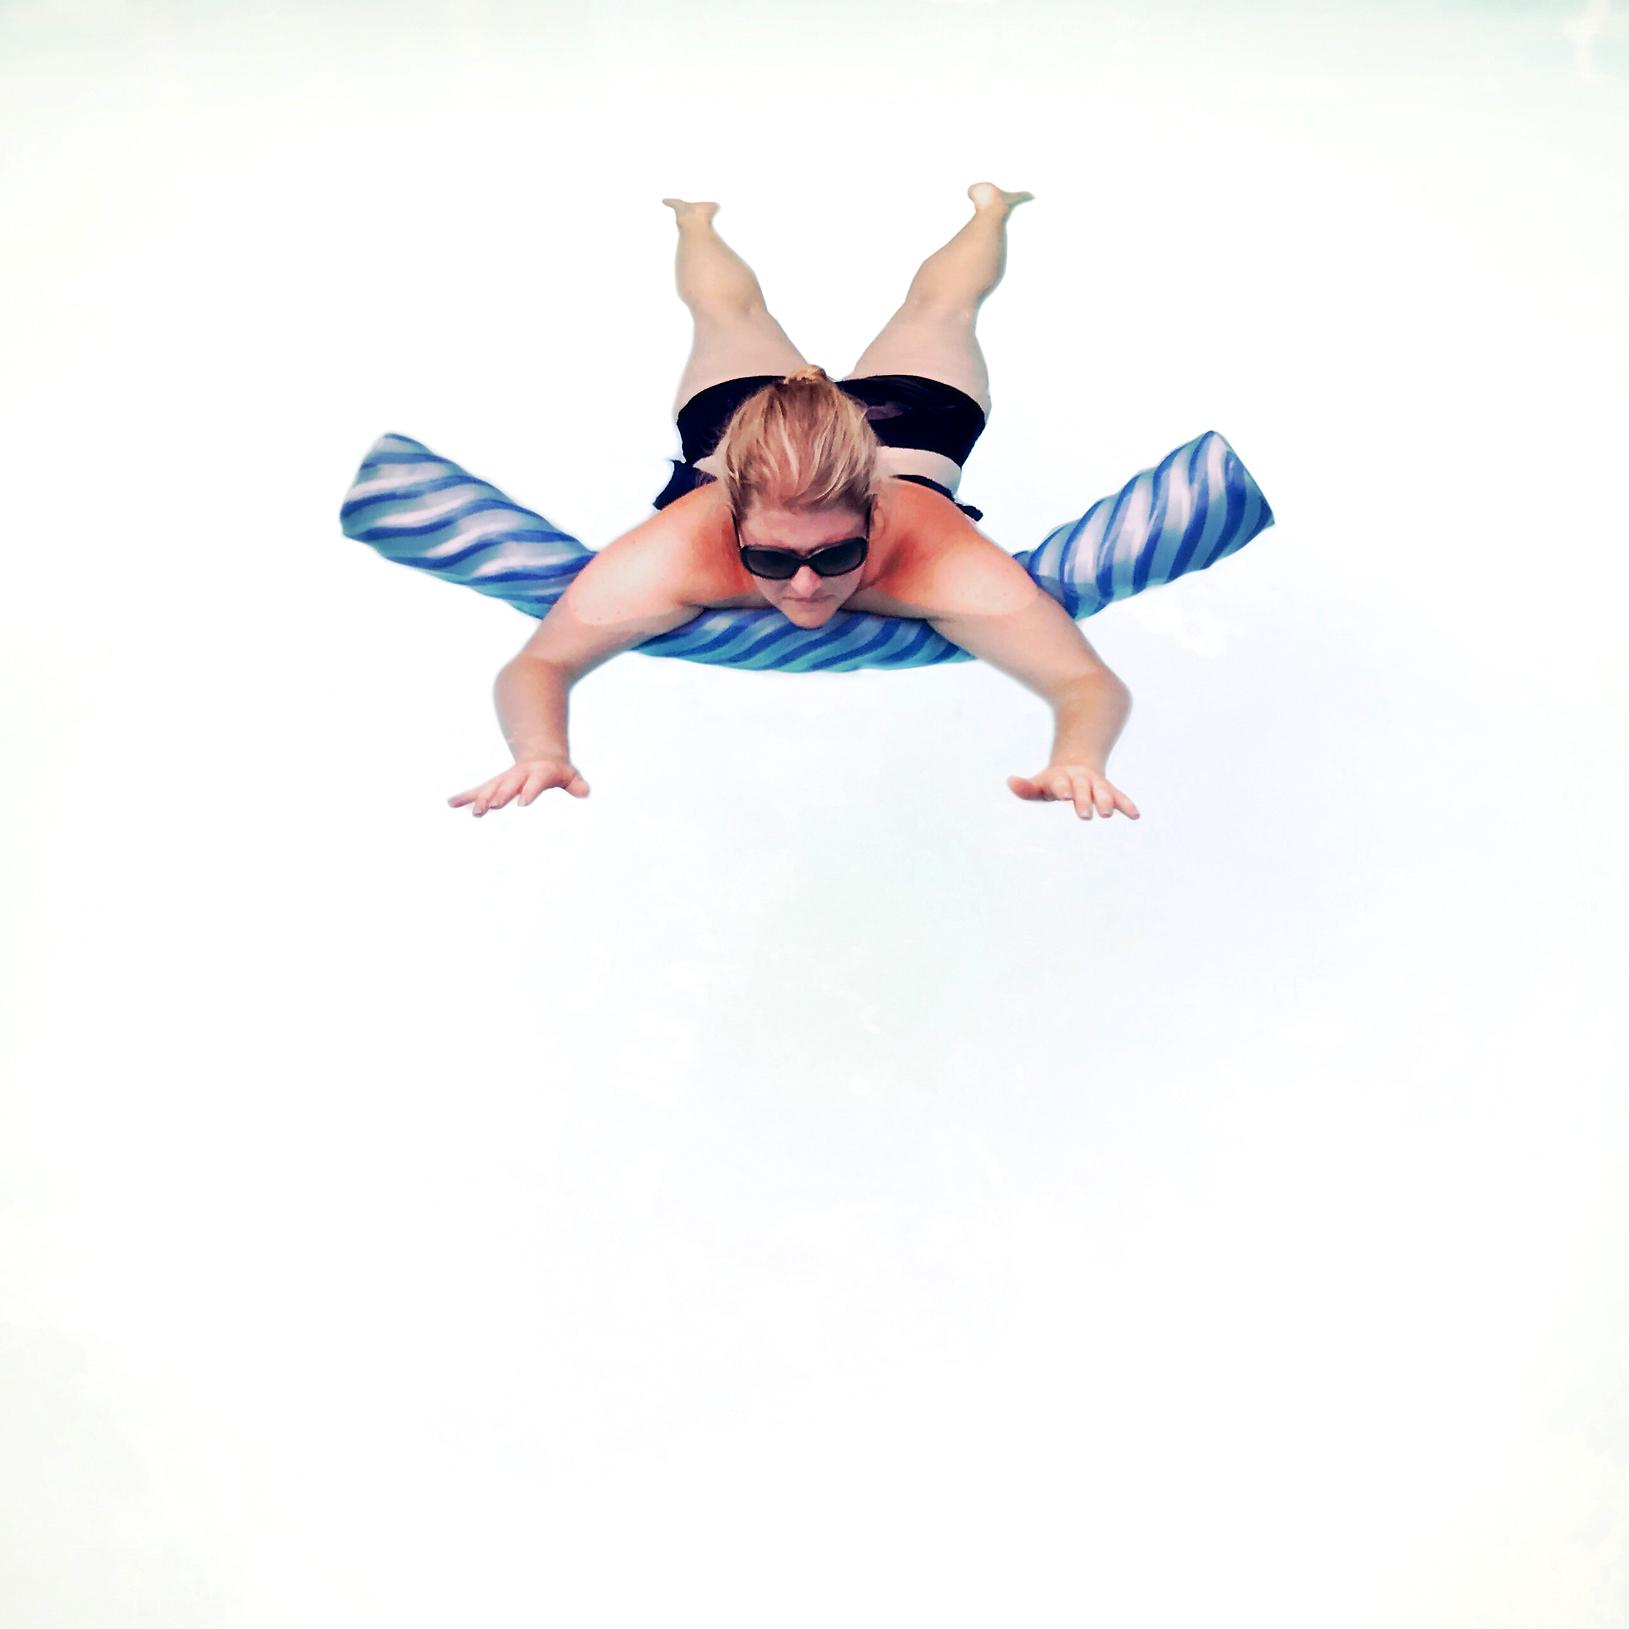 ktowne_swimming.jpg